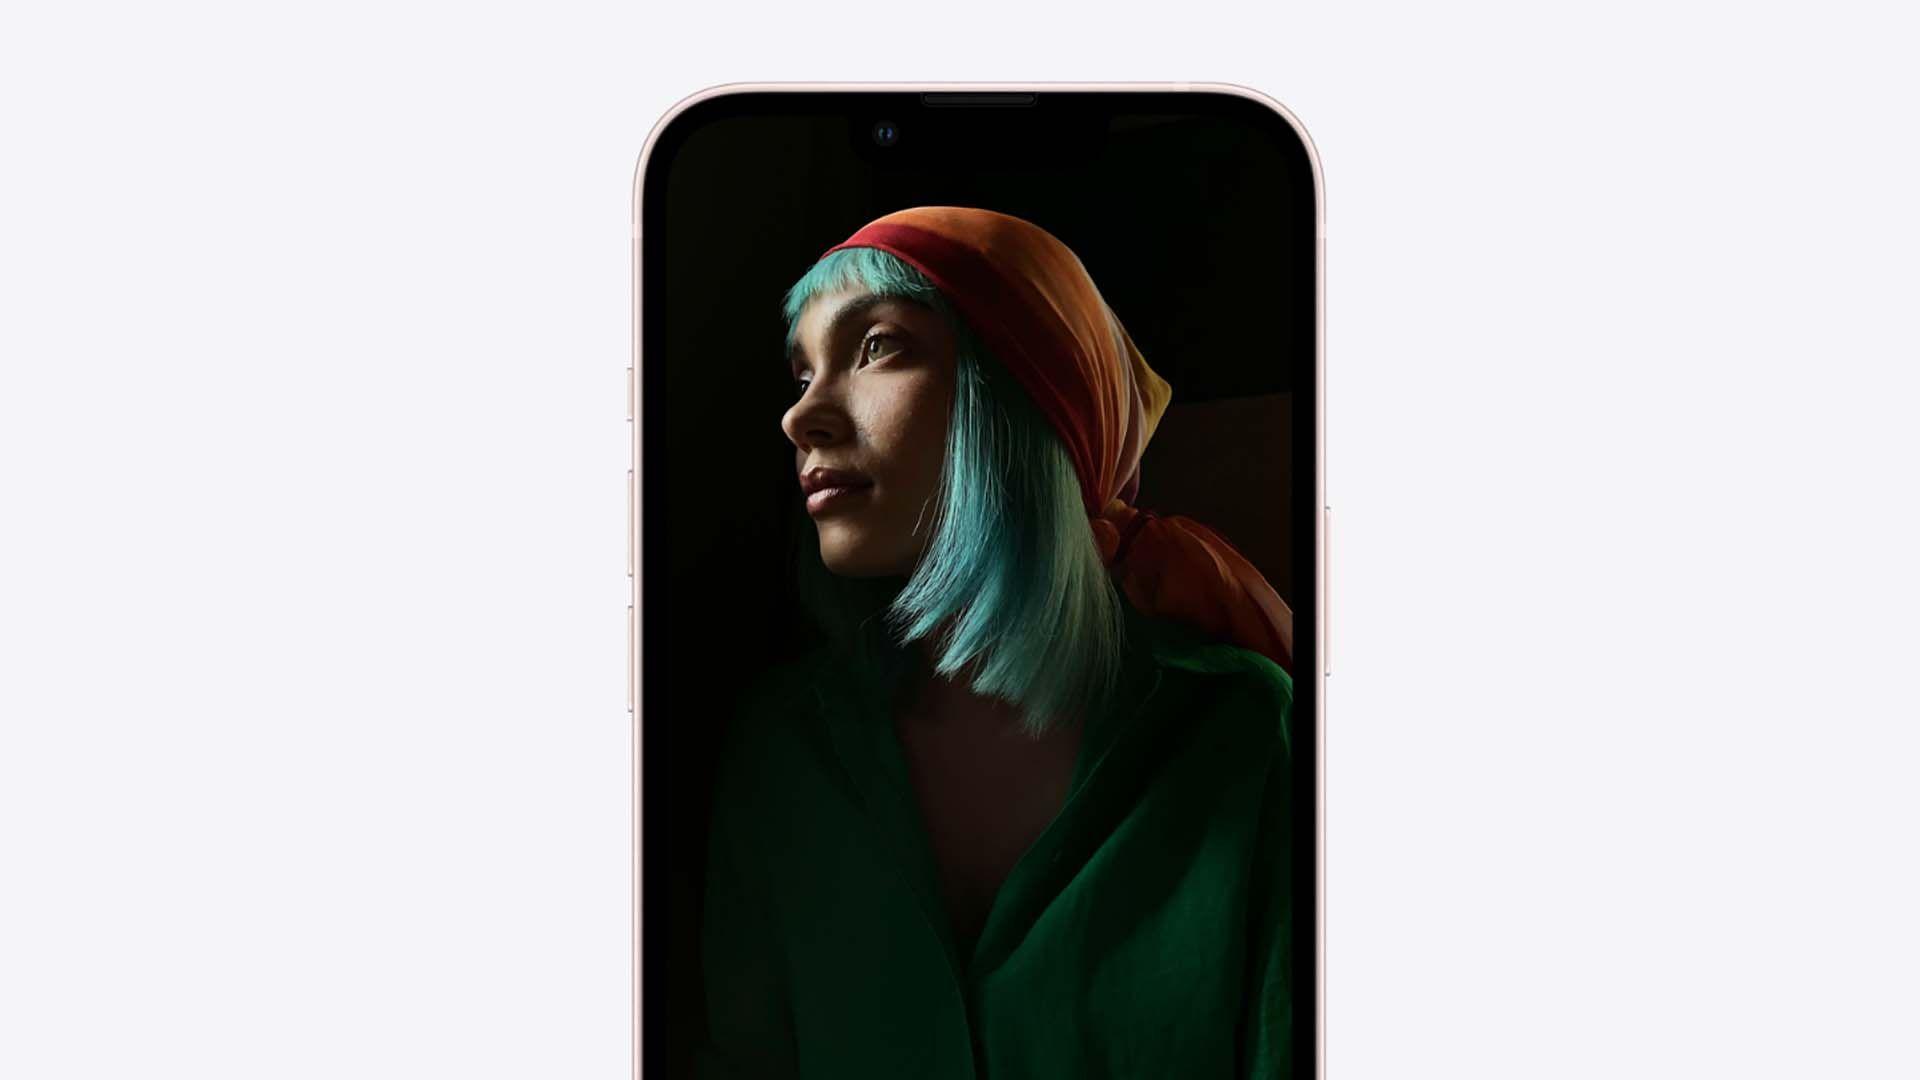 Imagem da tela do iPhone 13 Mini